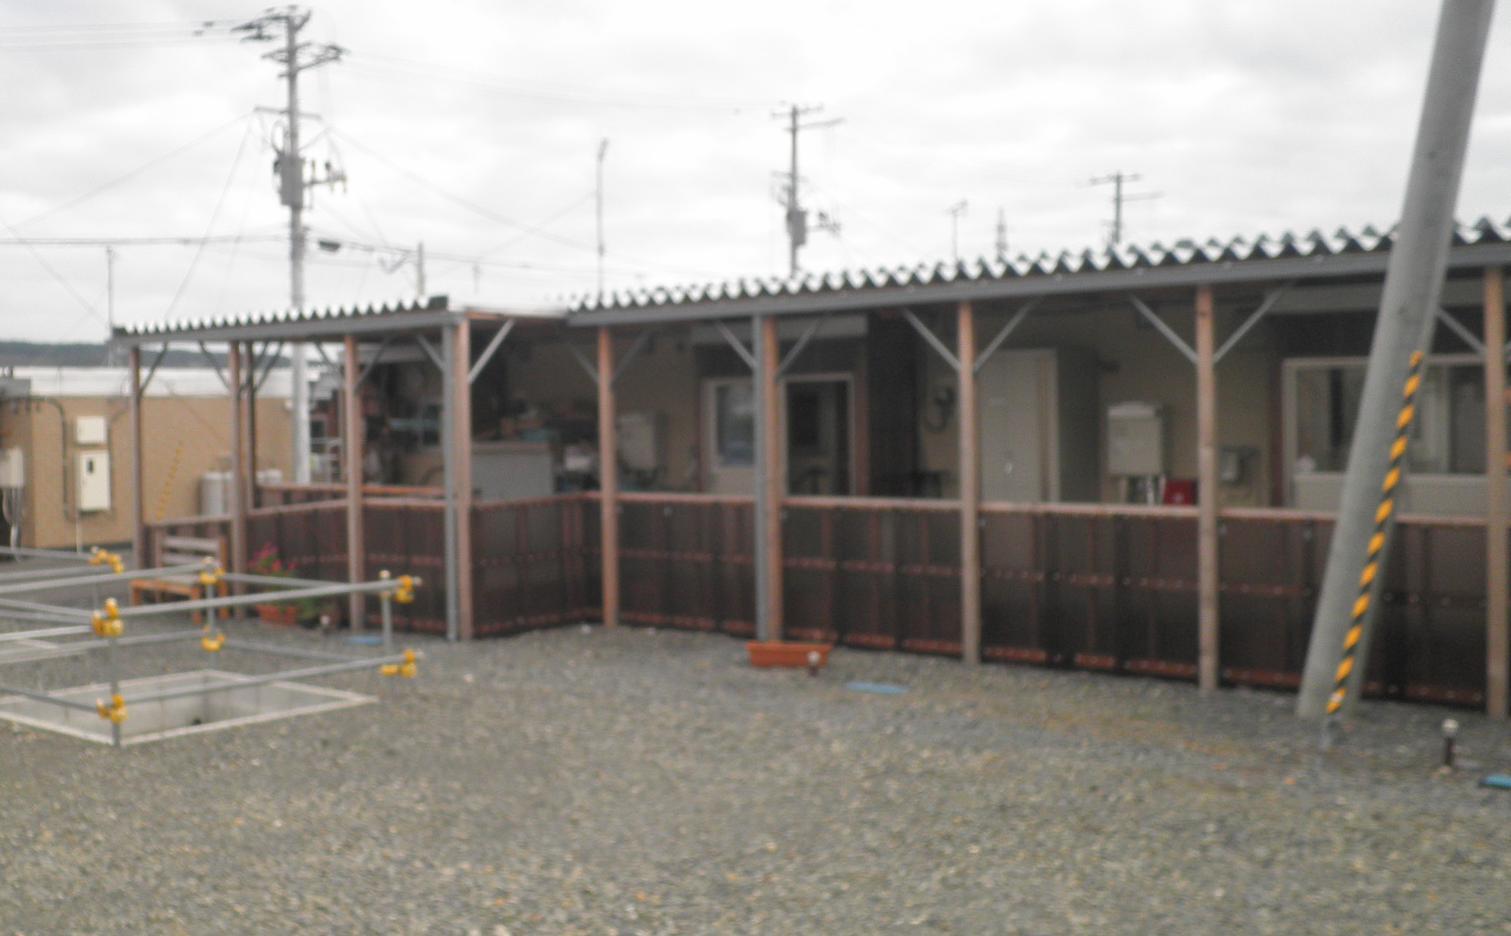 http://yamadakohei.jp/blog_upfile/%E8%A2%AB%E7%81%BD%E5%9C%B0%E6%94%AF%E6%8F%B4201211%E2%91%A3.JPG